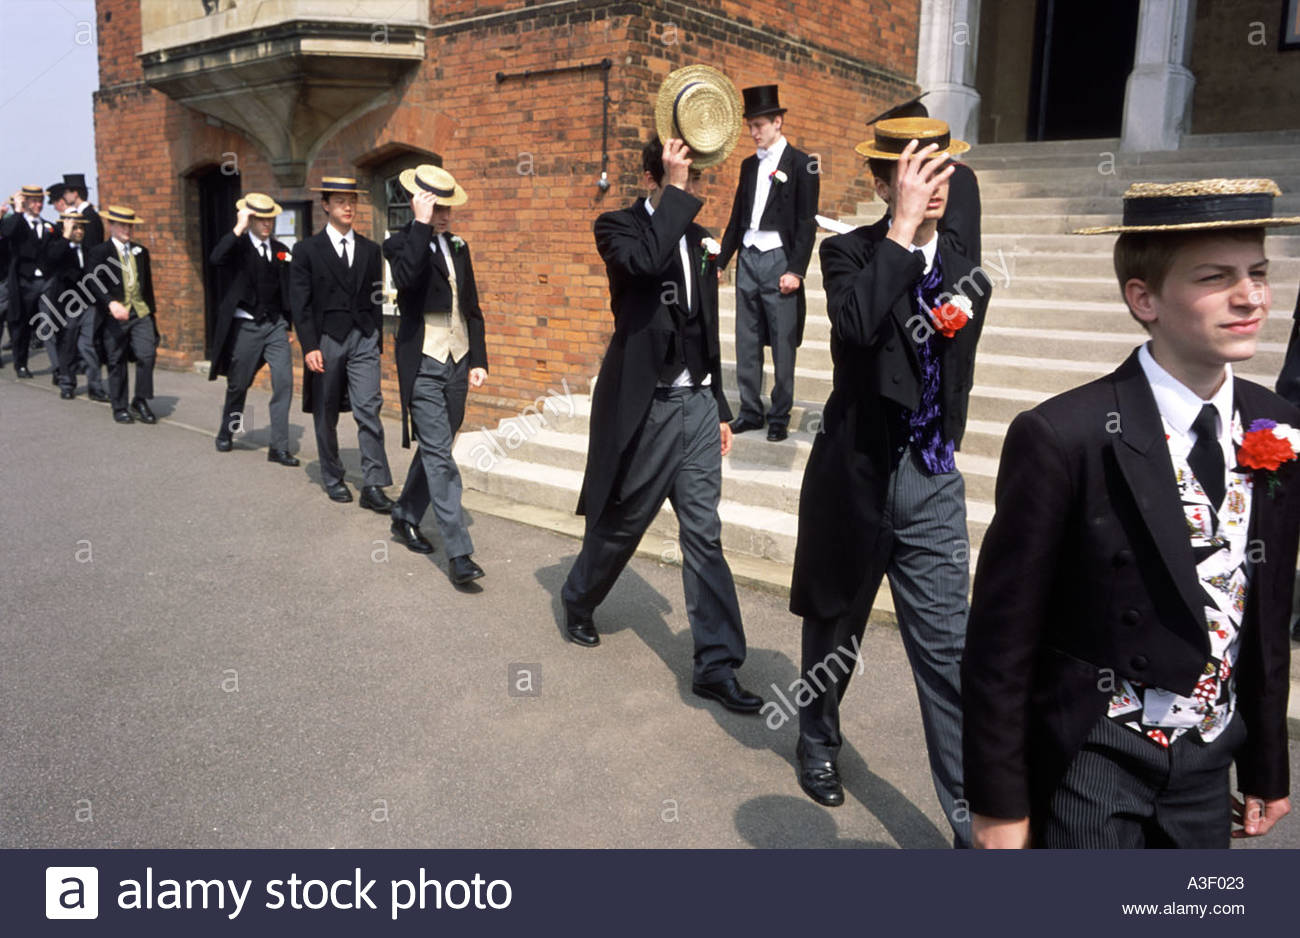 3b0d8fd5b Harrow School Boys Stock Photos & Harrow School Boys Stock Images ...